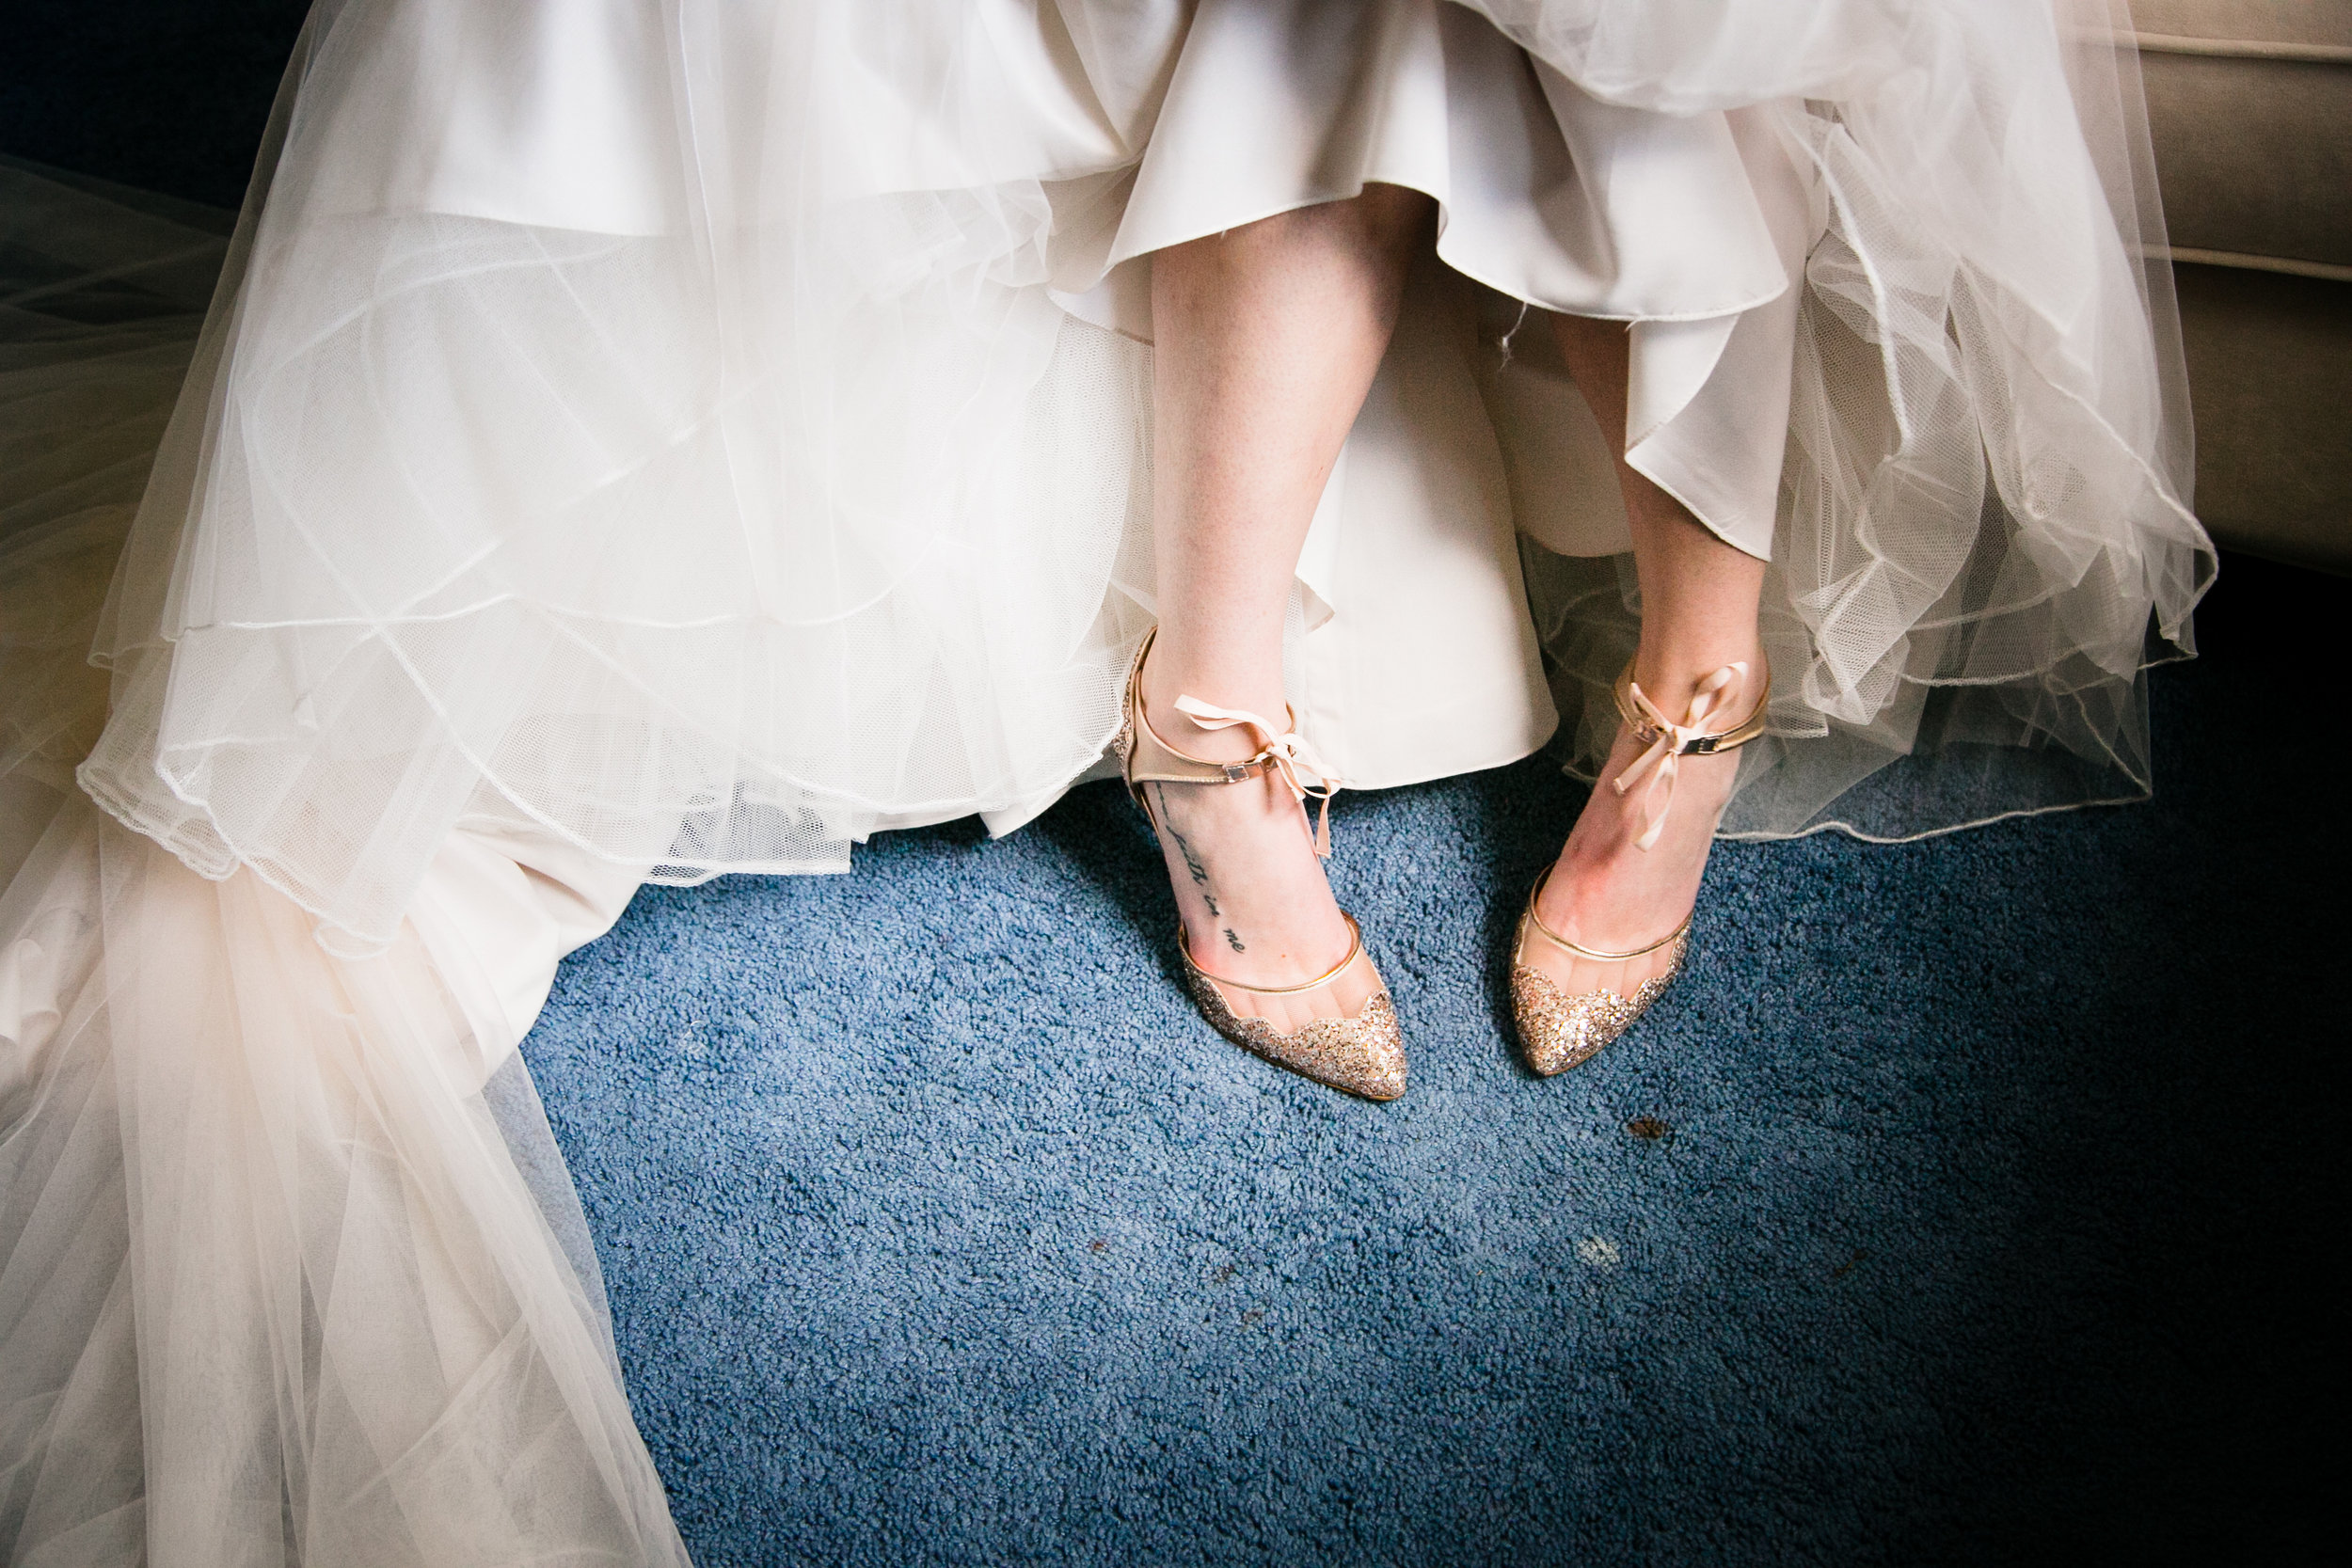 LA LUNA BANQUET HALL WEDDING BENSALEM - 023.jpg